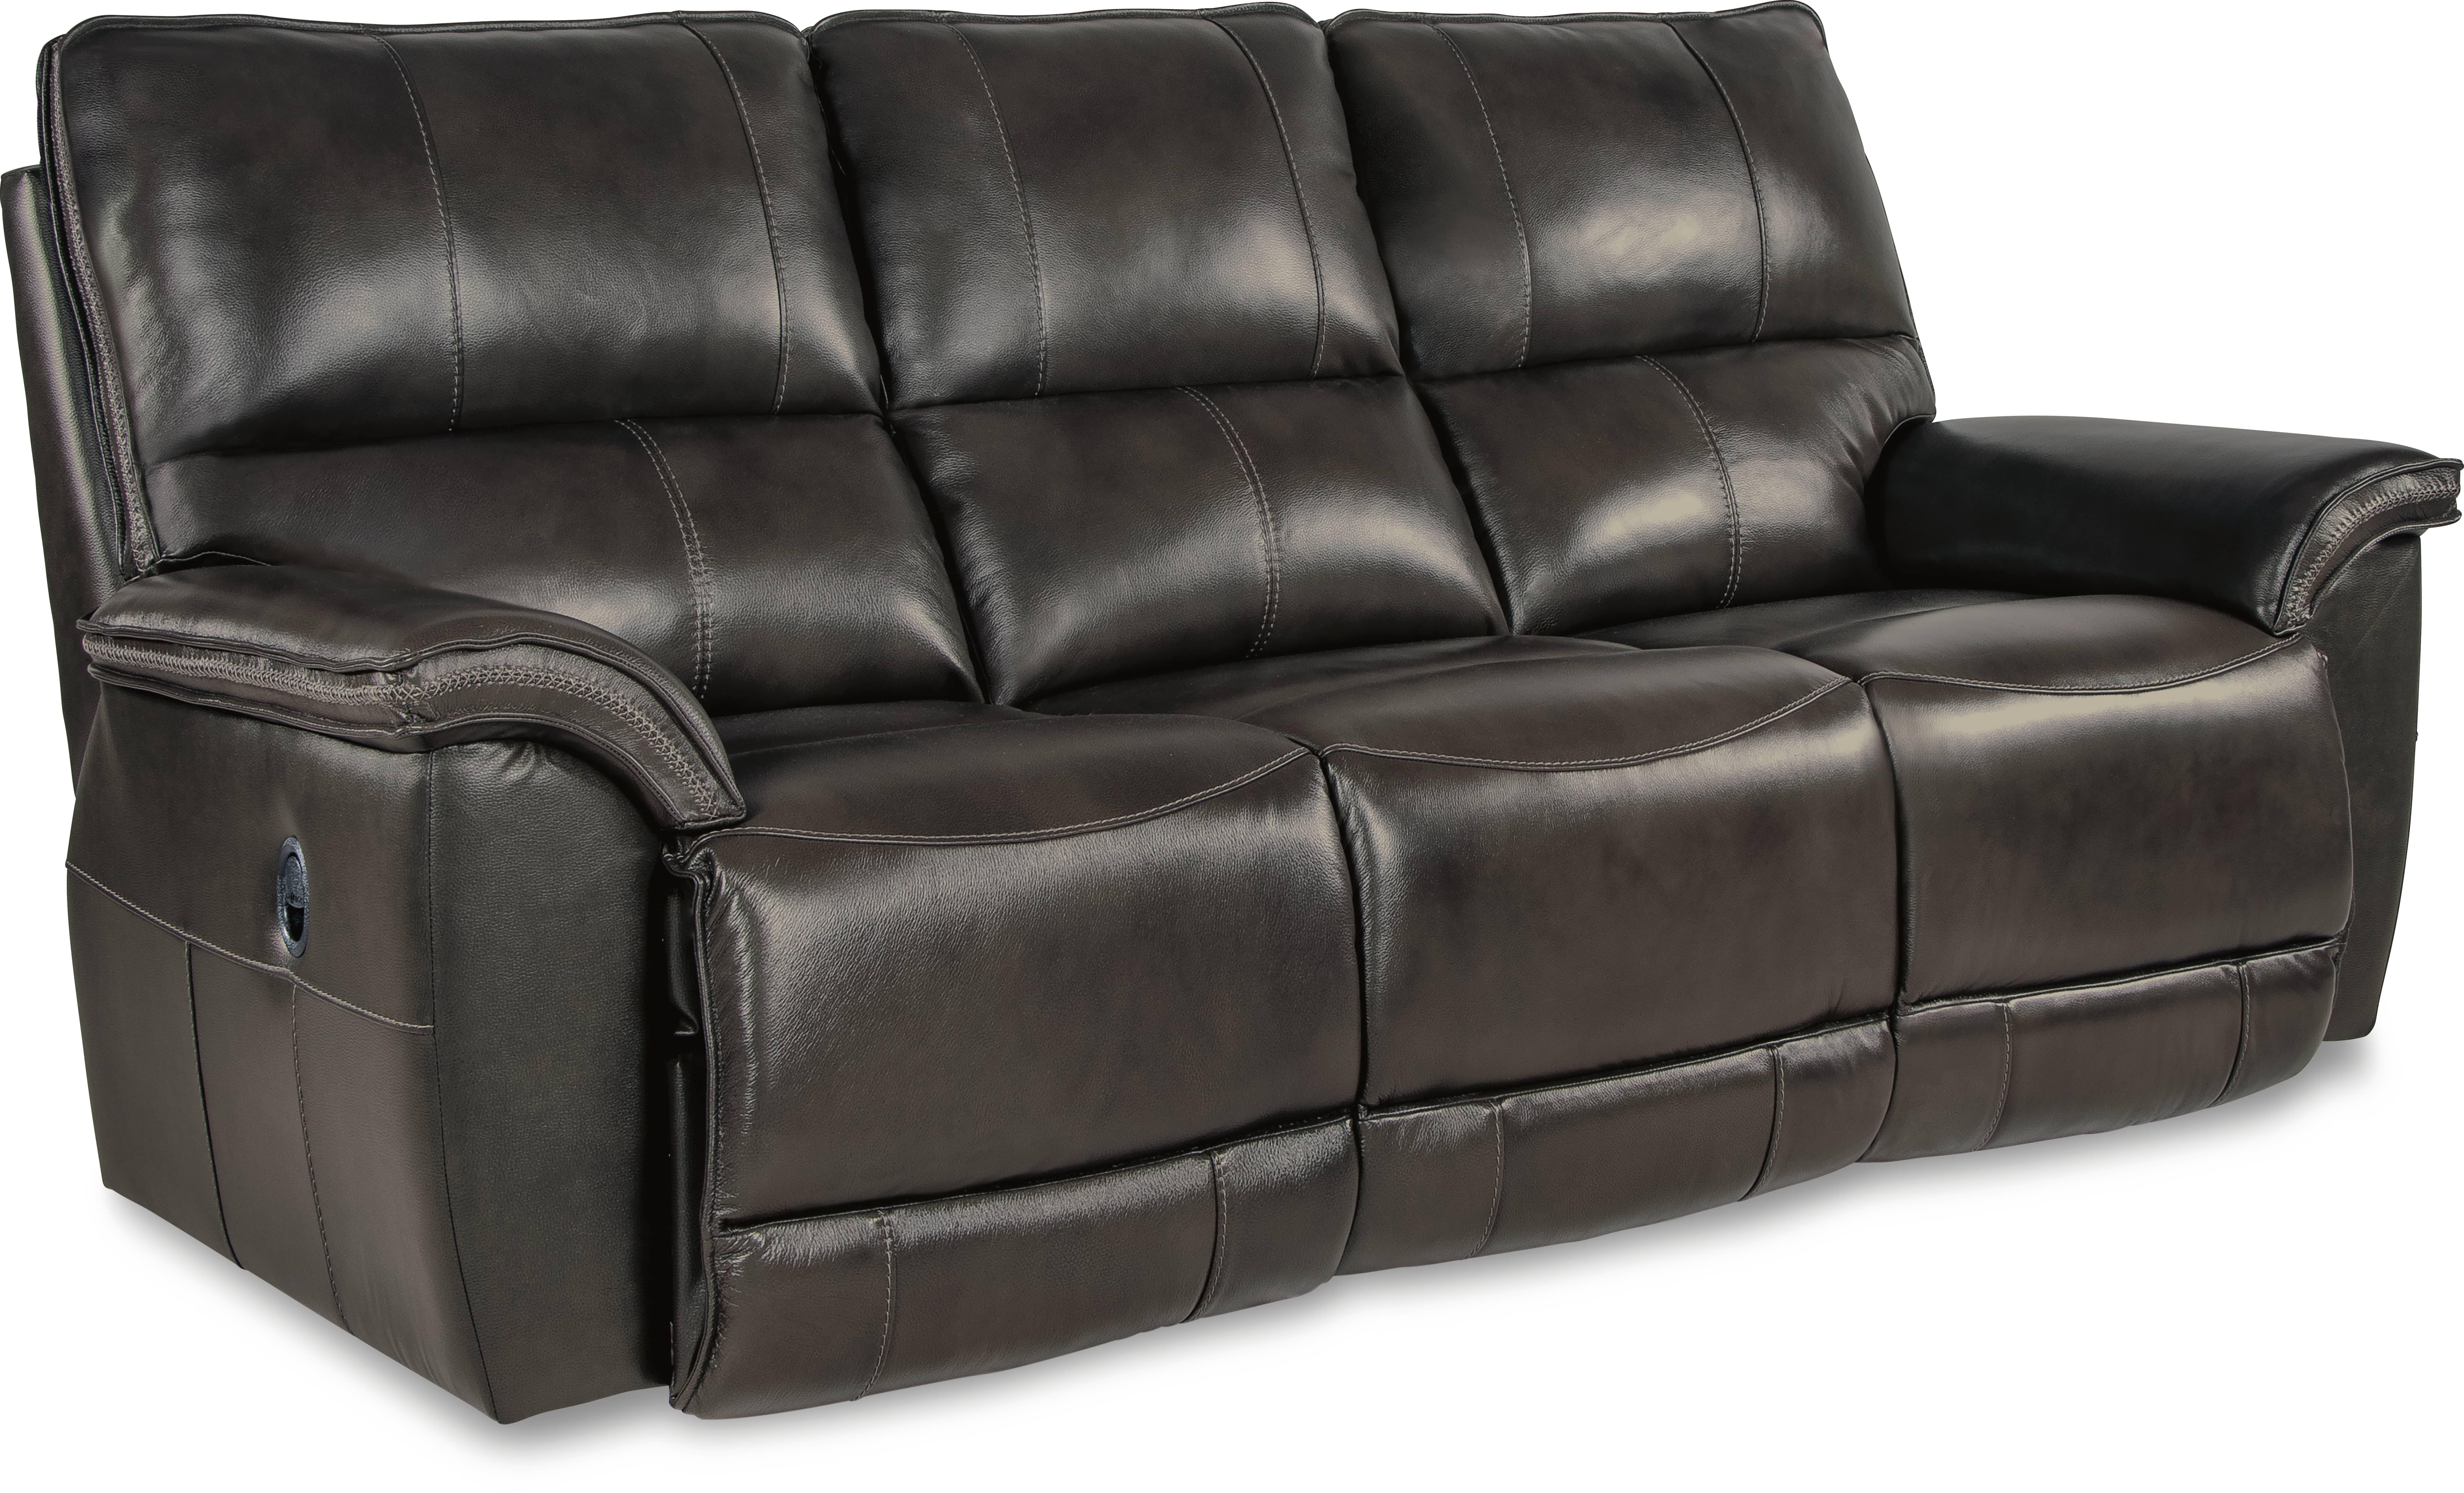 Norris Full Reclining Sofa